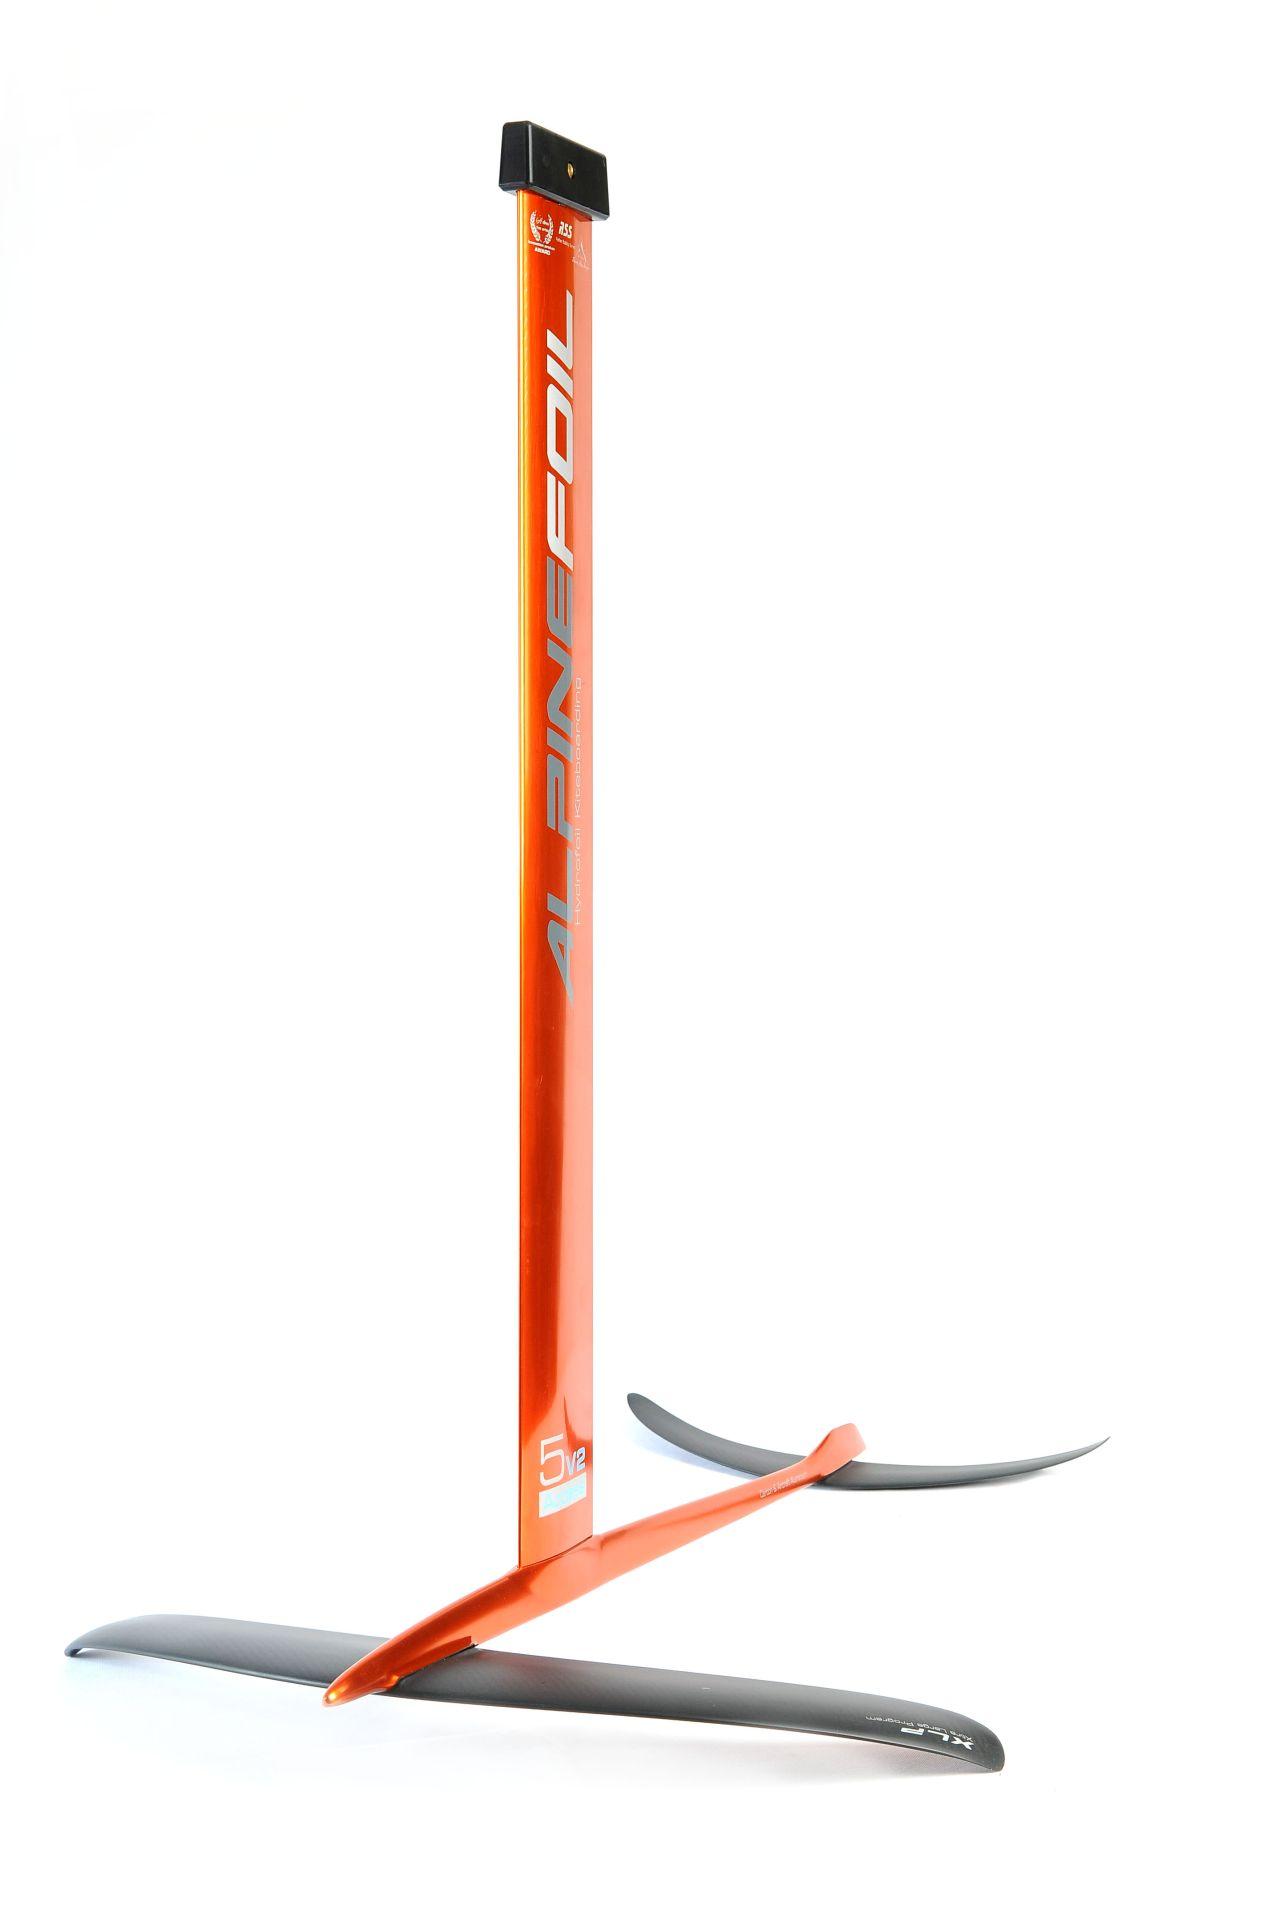 Kitefoil alpinefoil access v2 07 soft nose 7 copie 1